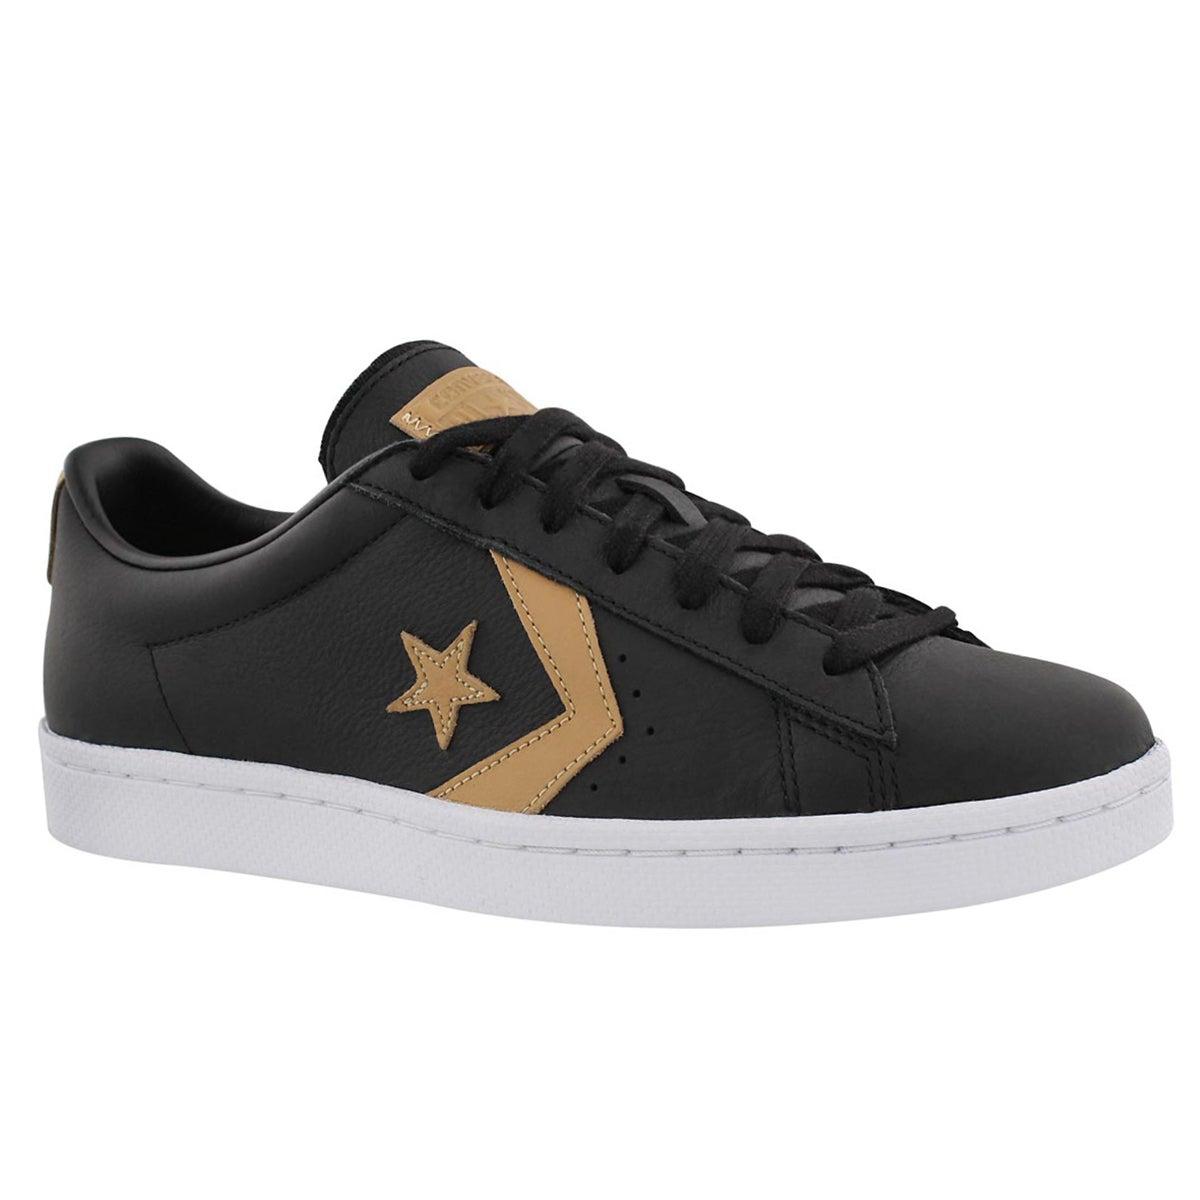 Men's PL 76 black sneakers